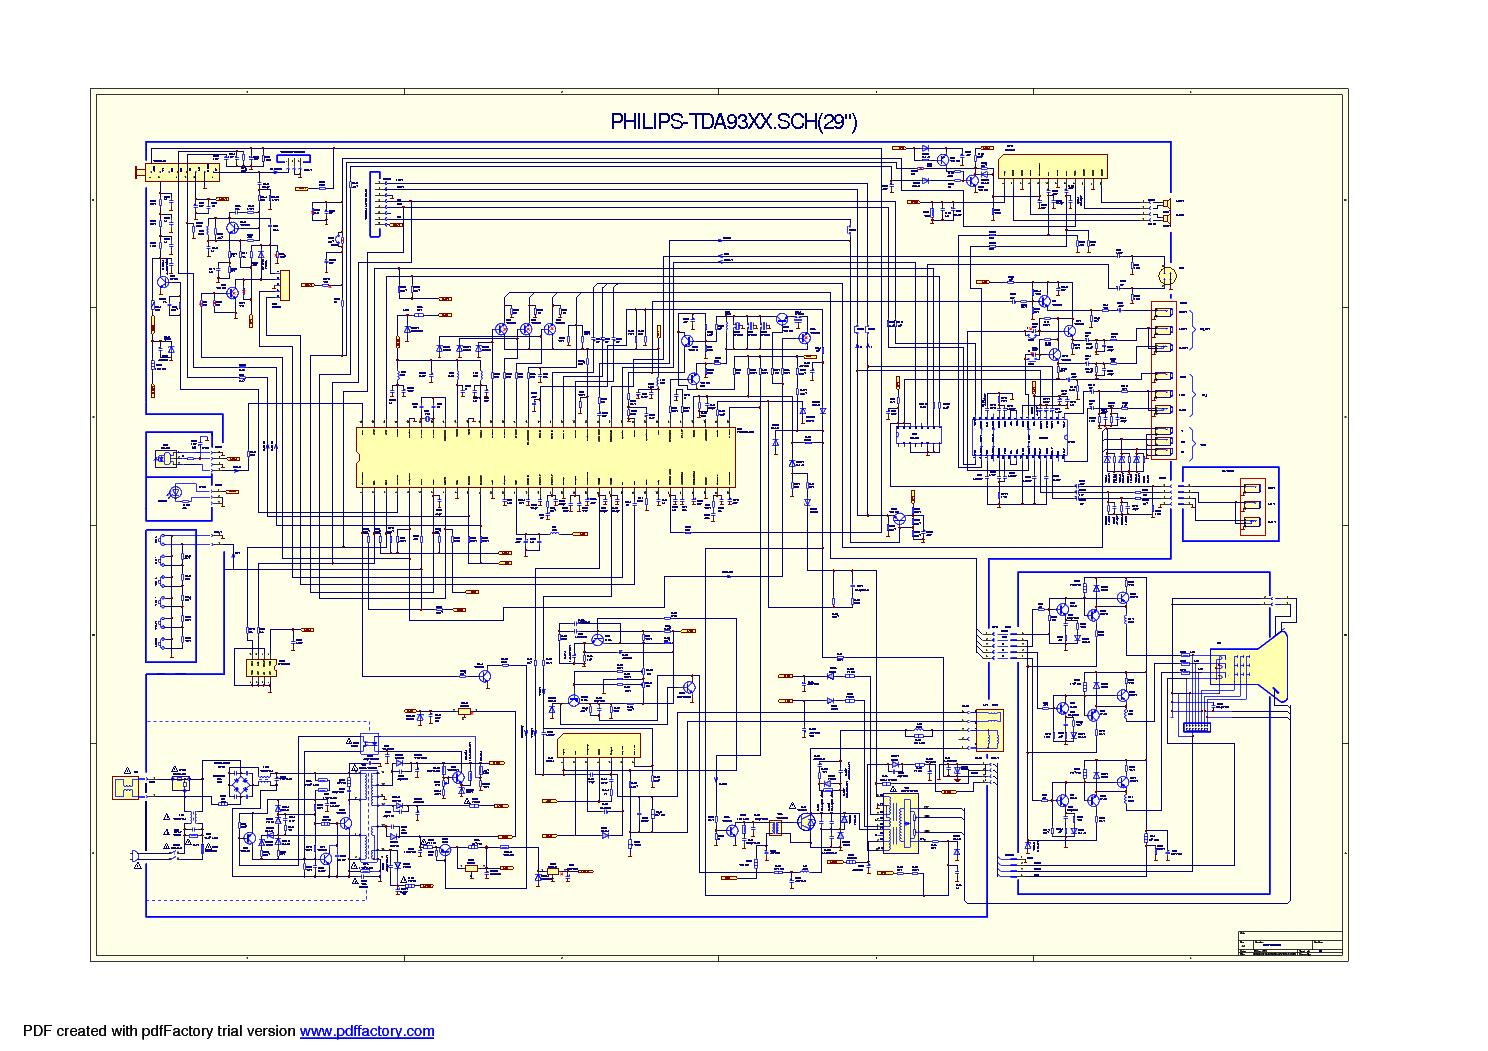 Gaba Philips 29 Th29pnl Service Manual Download Schematics Eeprom Electronic Circuit Diagram Tv Vertical Using La78041 La78040 1st Page